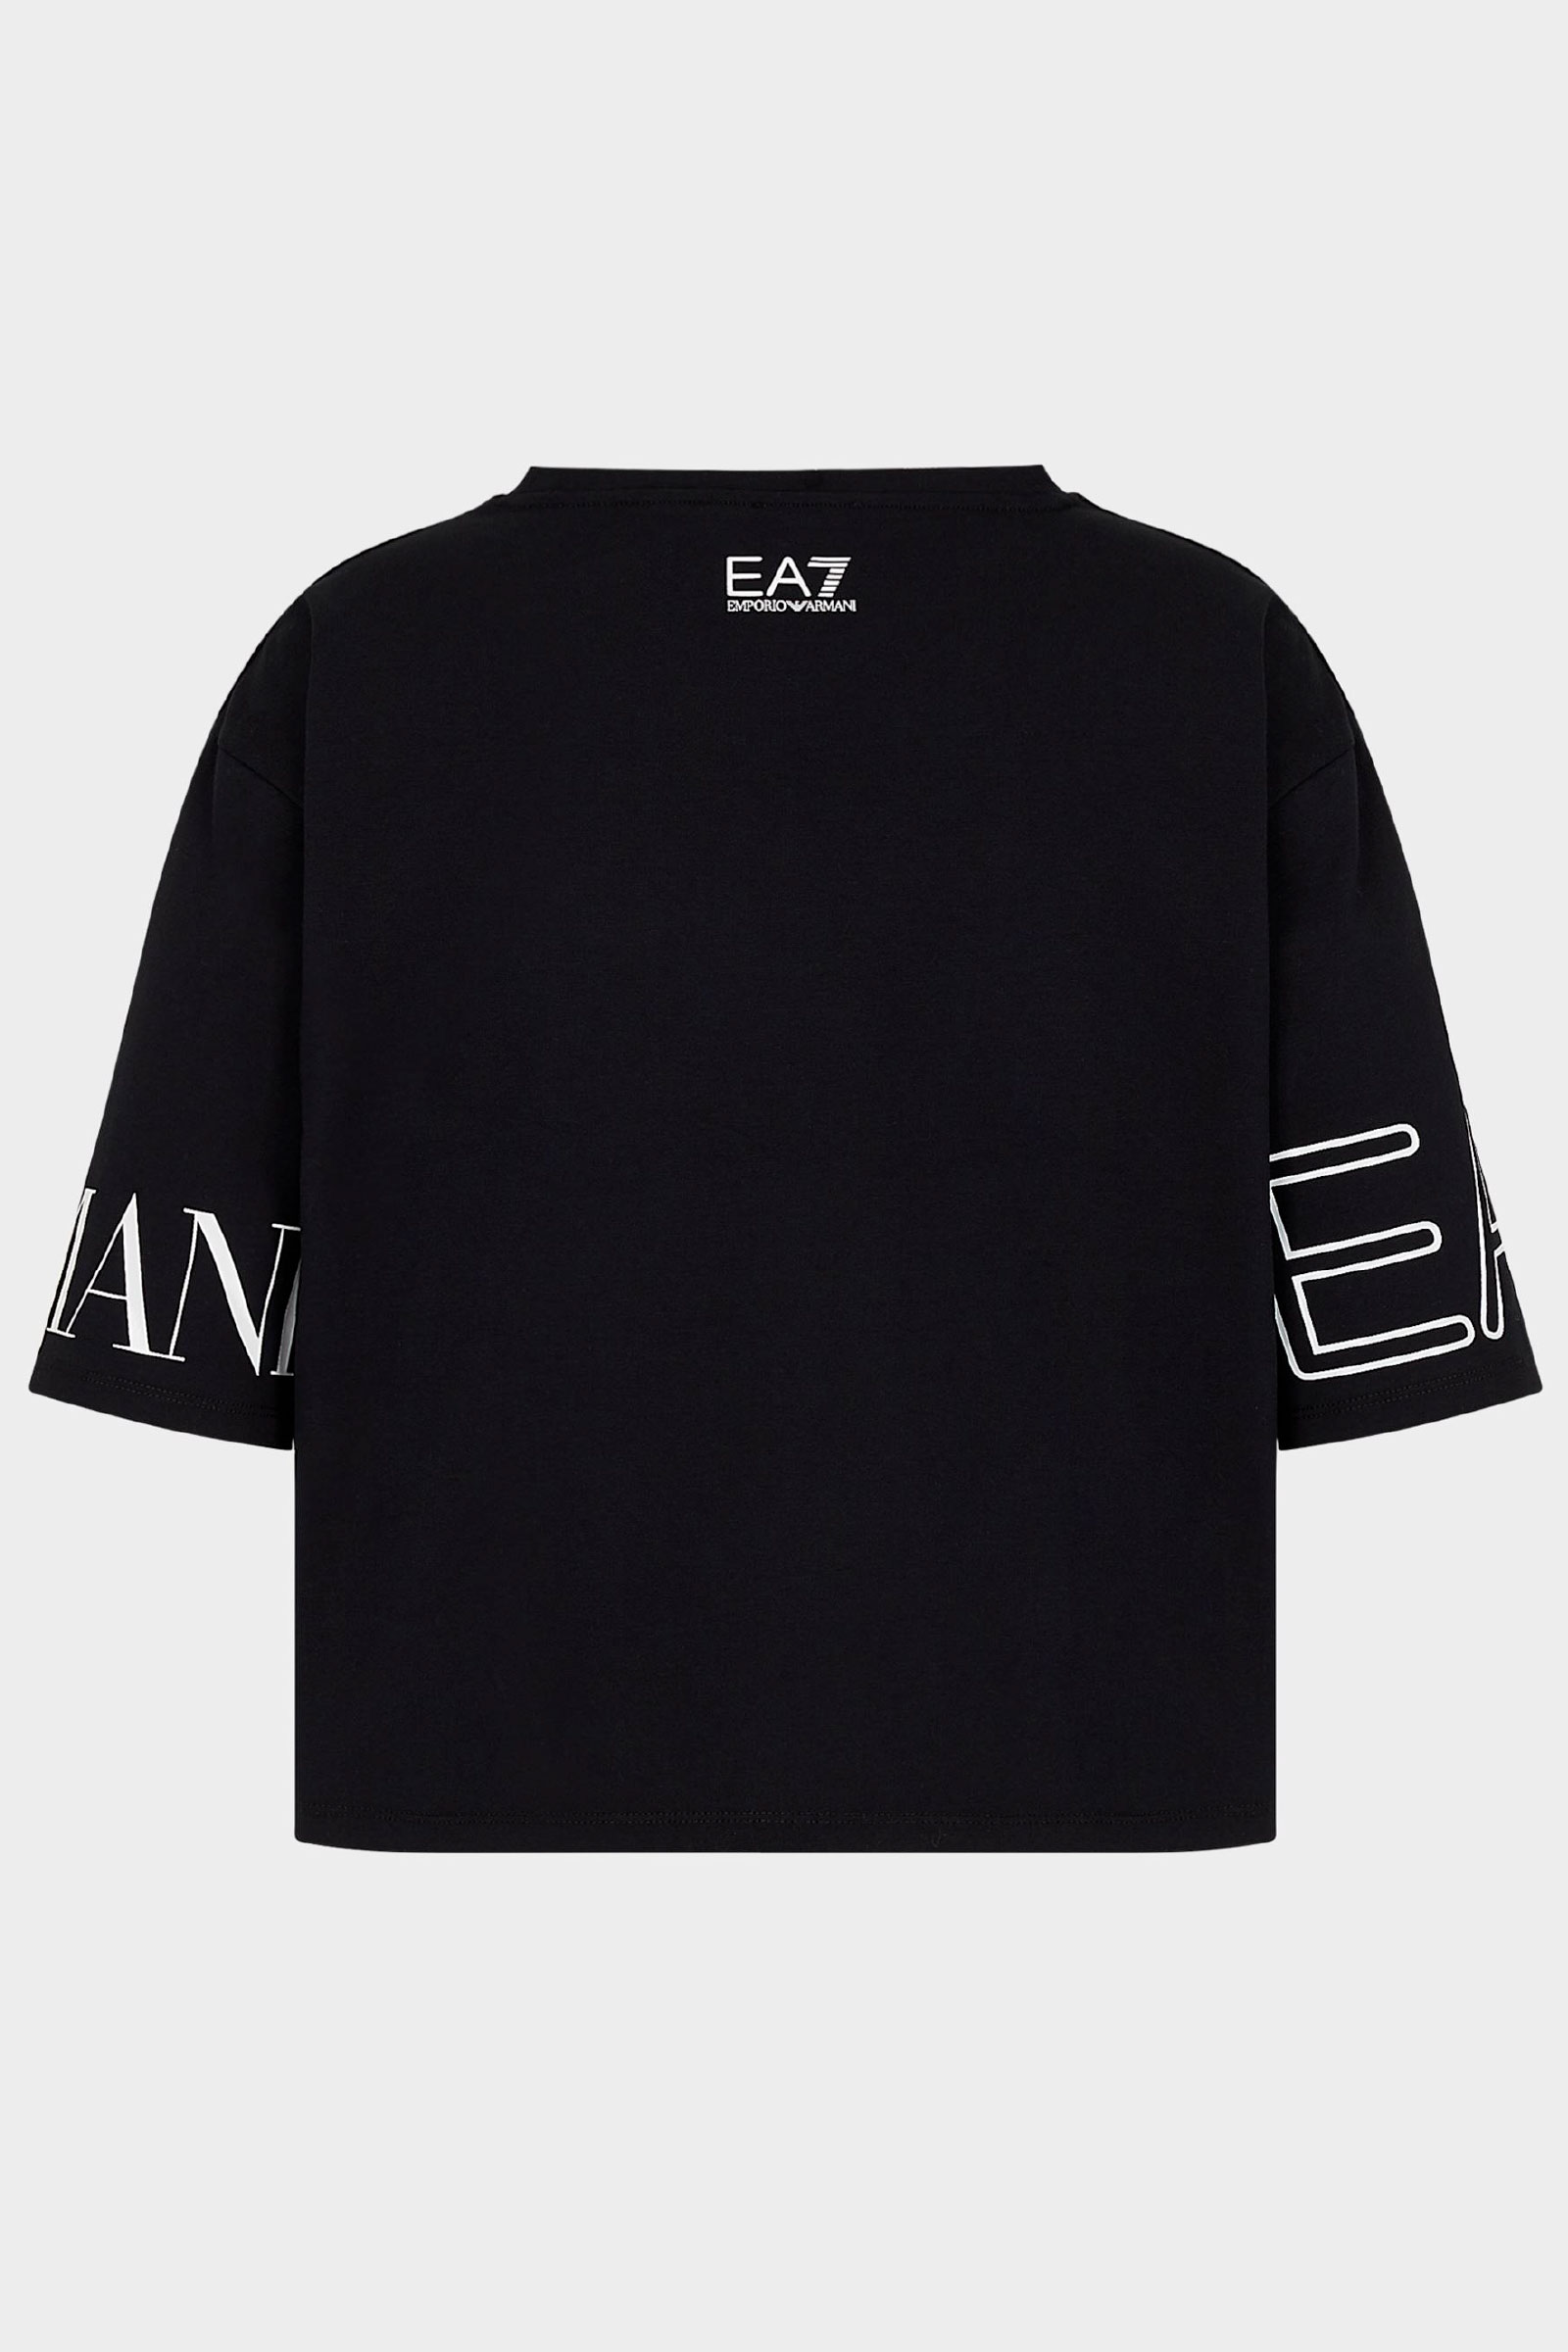 ARMANI EA7 T-Shirt Donna ARMANI EA7 | T-Shirt | 3KTT18 TJ29Z0200